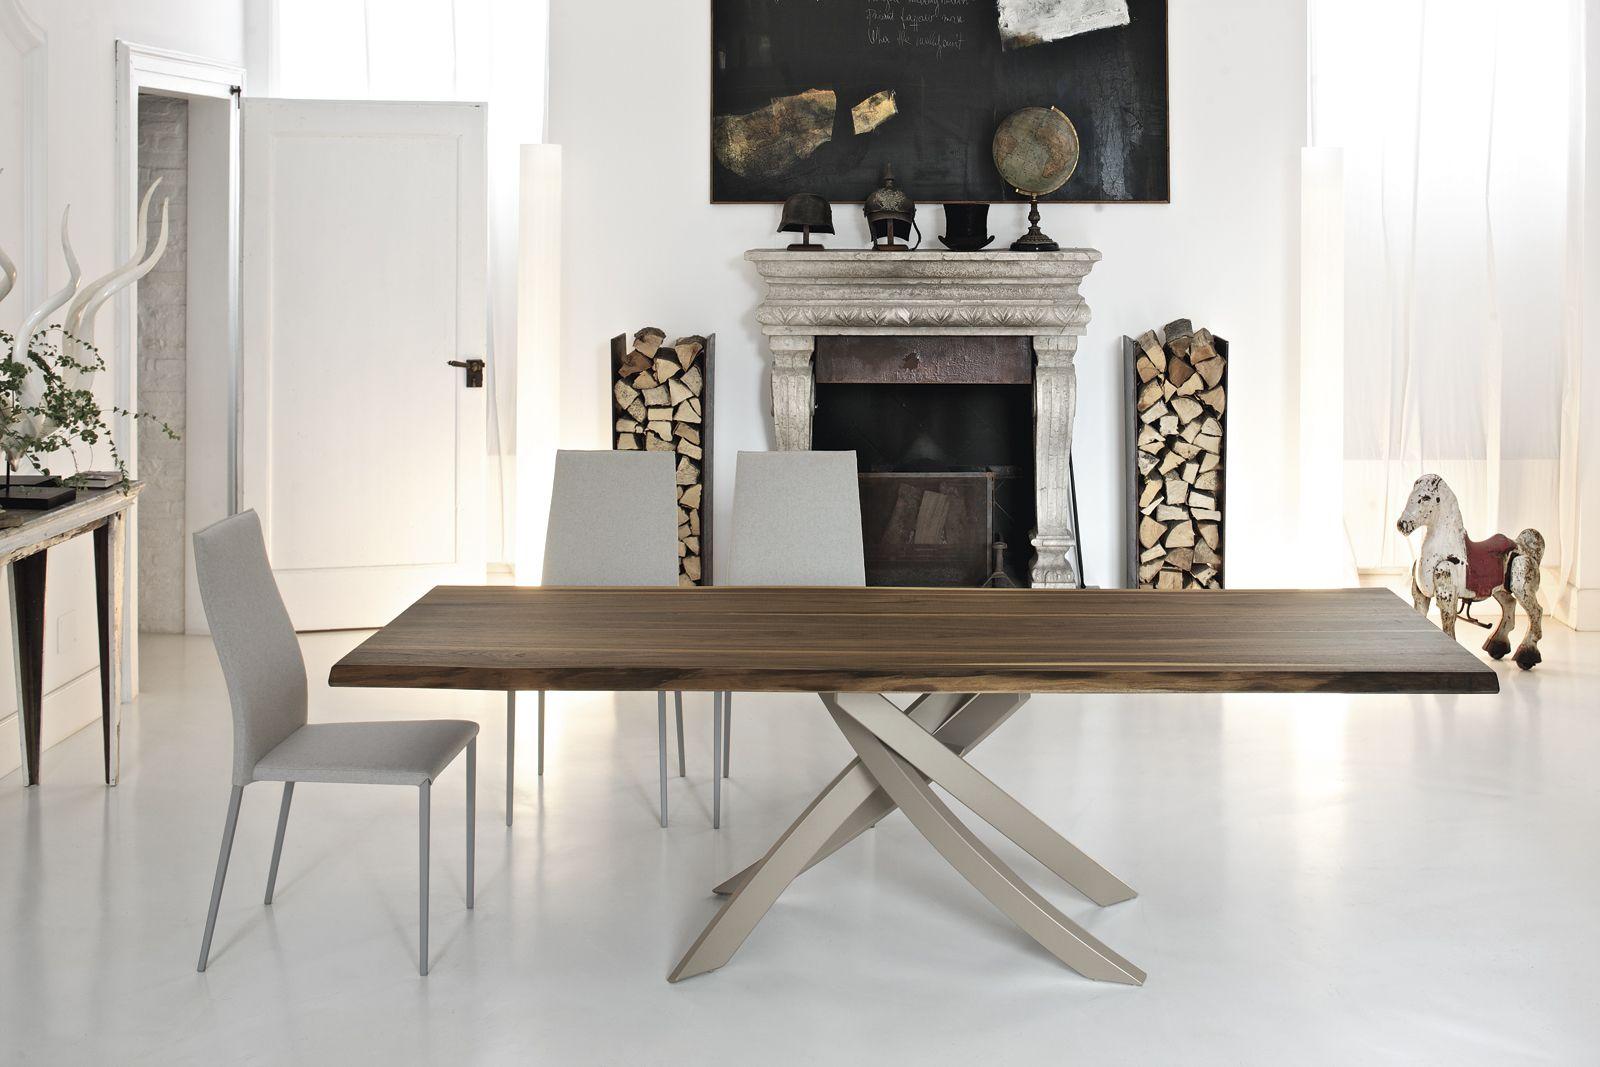 Sedie Eleganti ~ Bontempi mobili tavoli sedie complementi divani letti